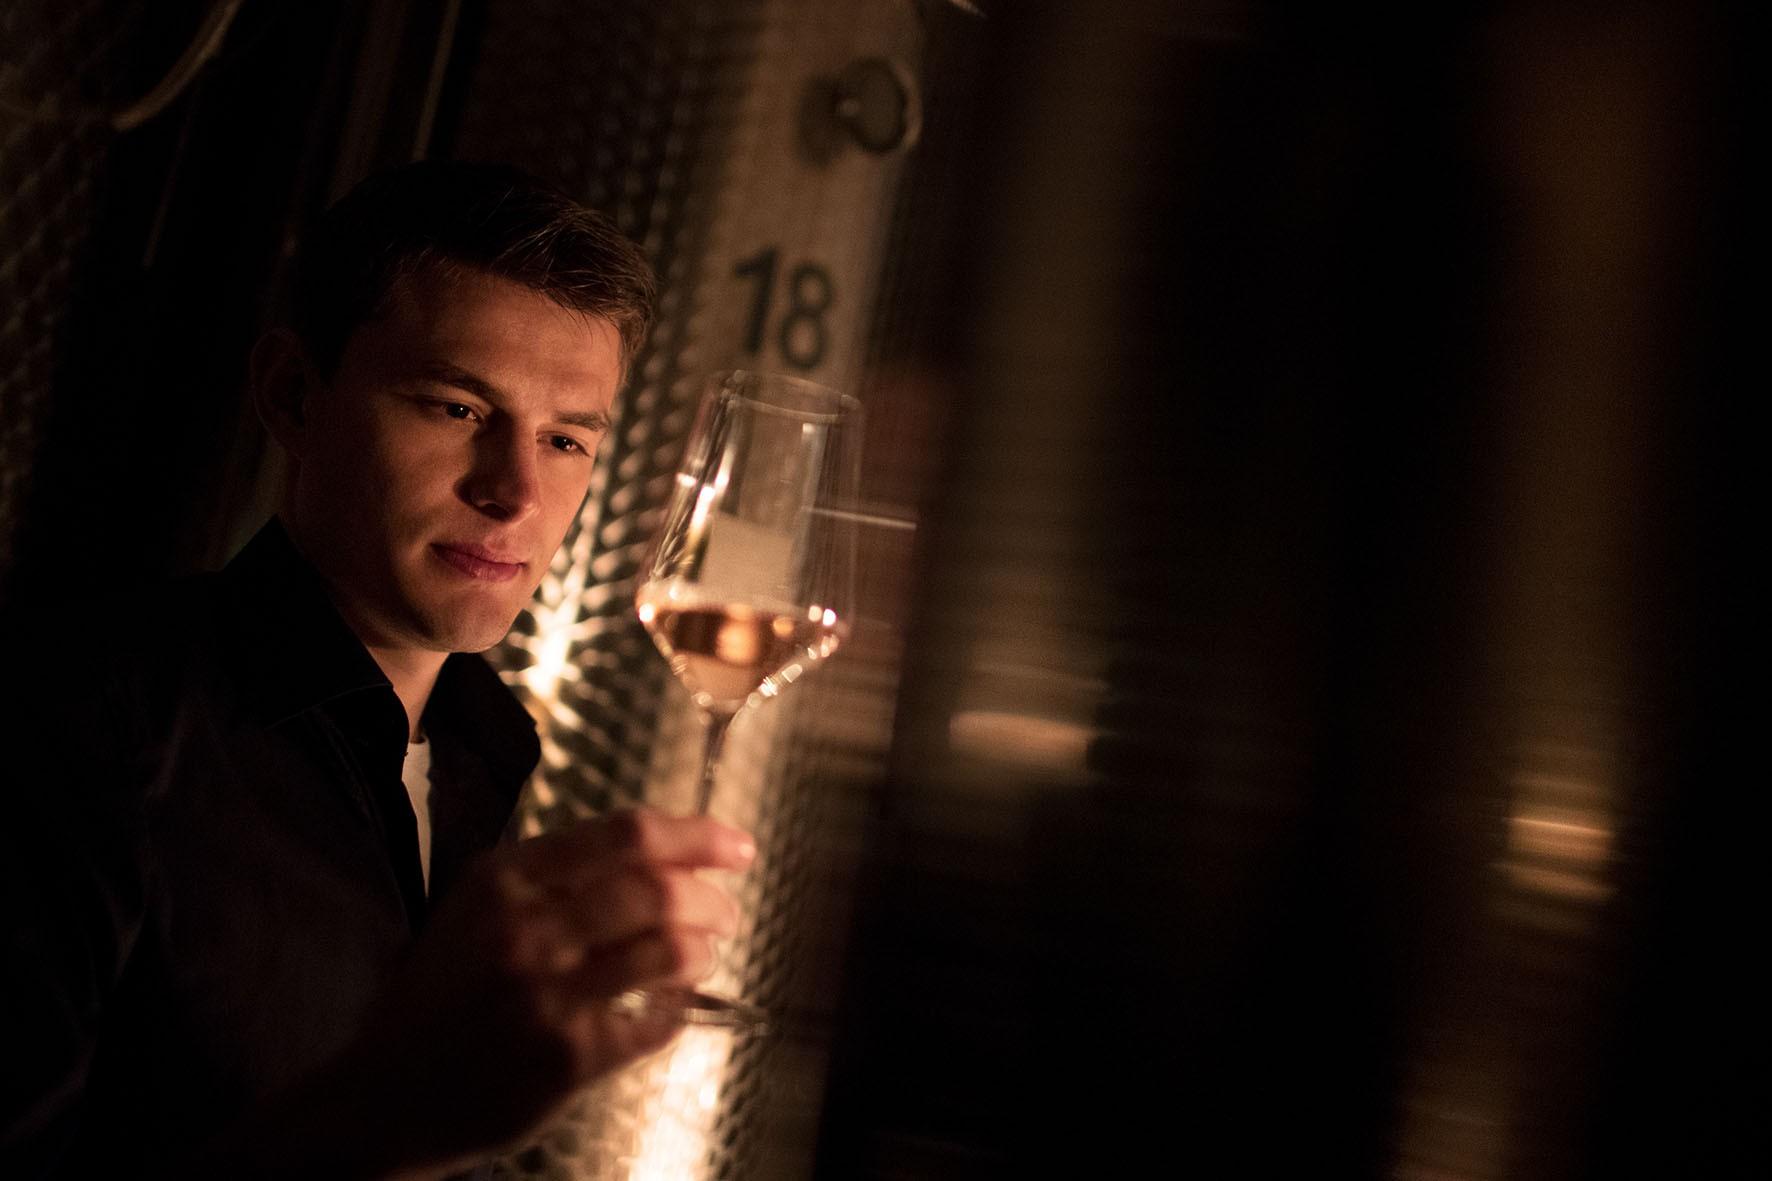 Stefan Hütter im Weinkeller